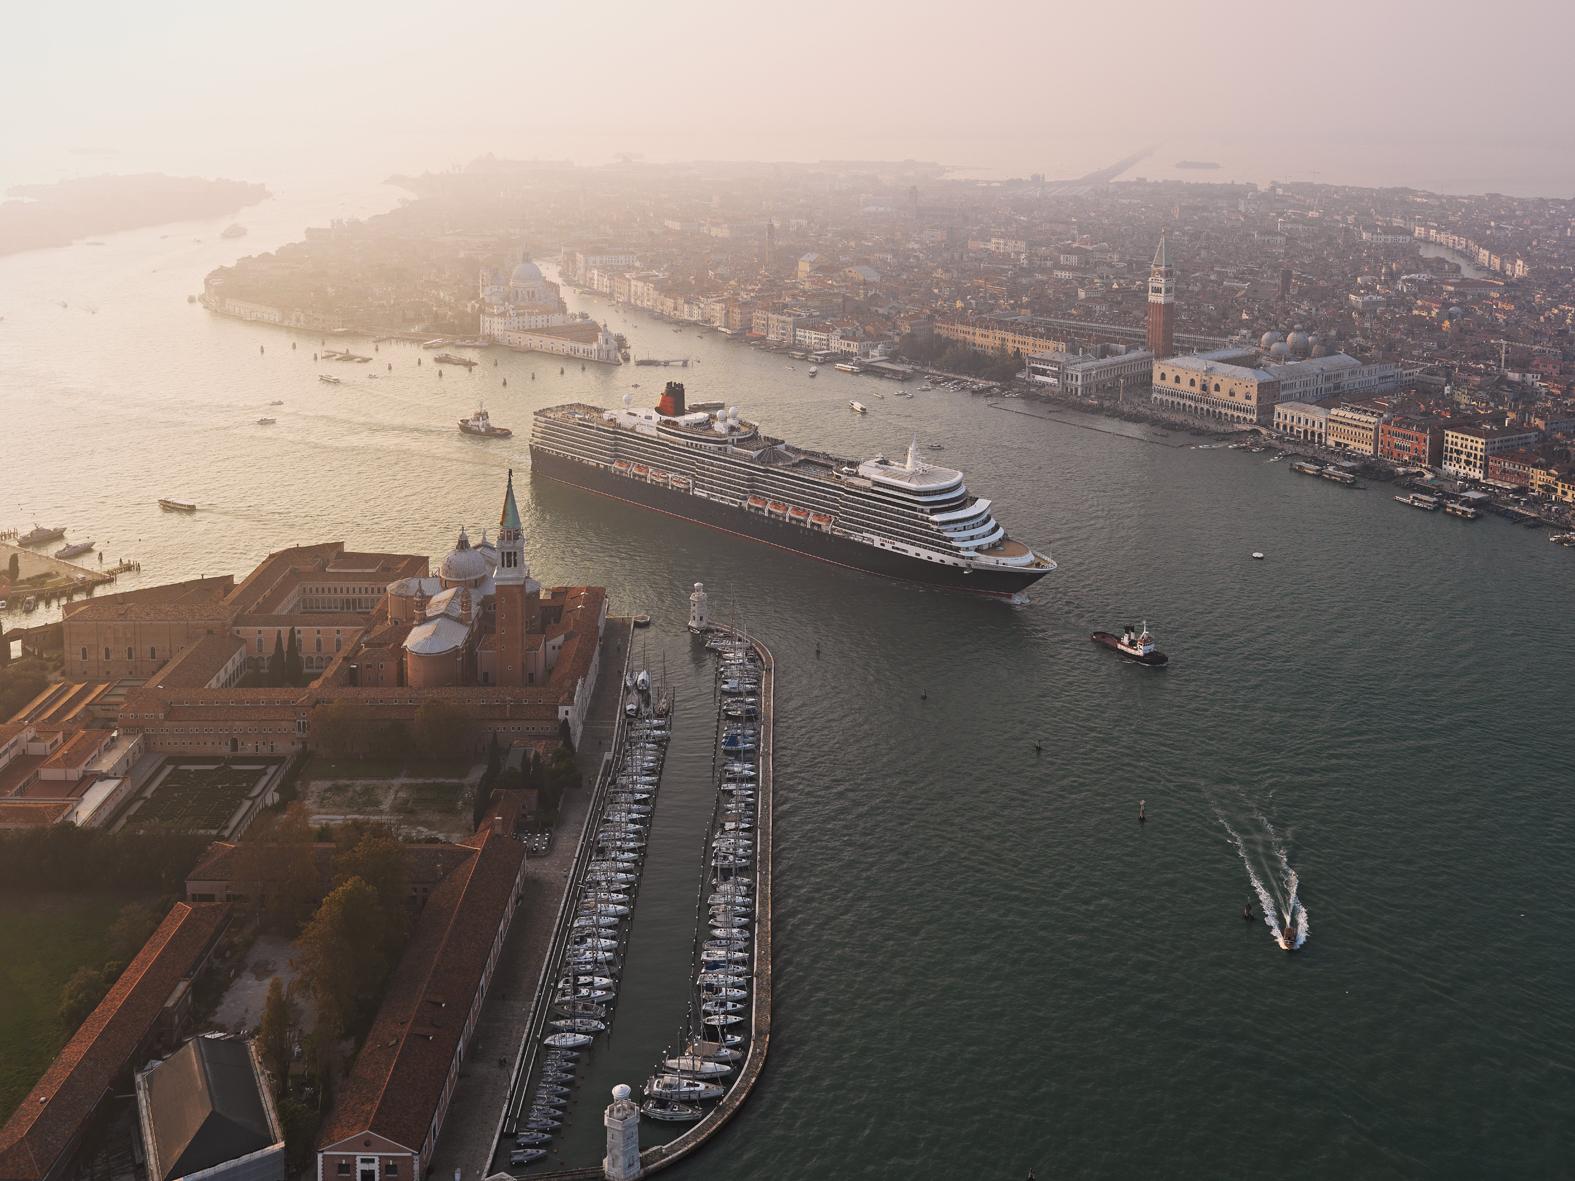 Grand canal QE Venice_6558656.jpg